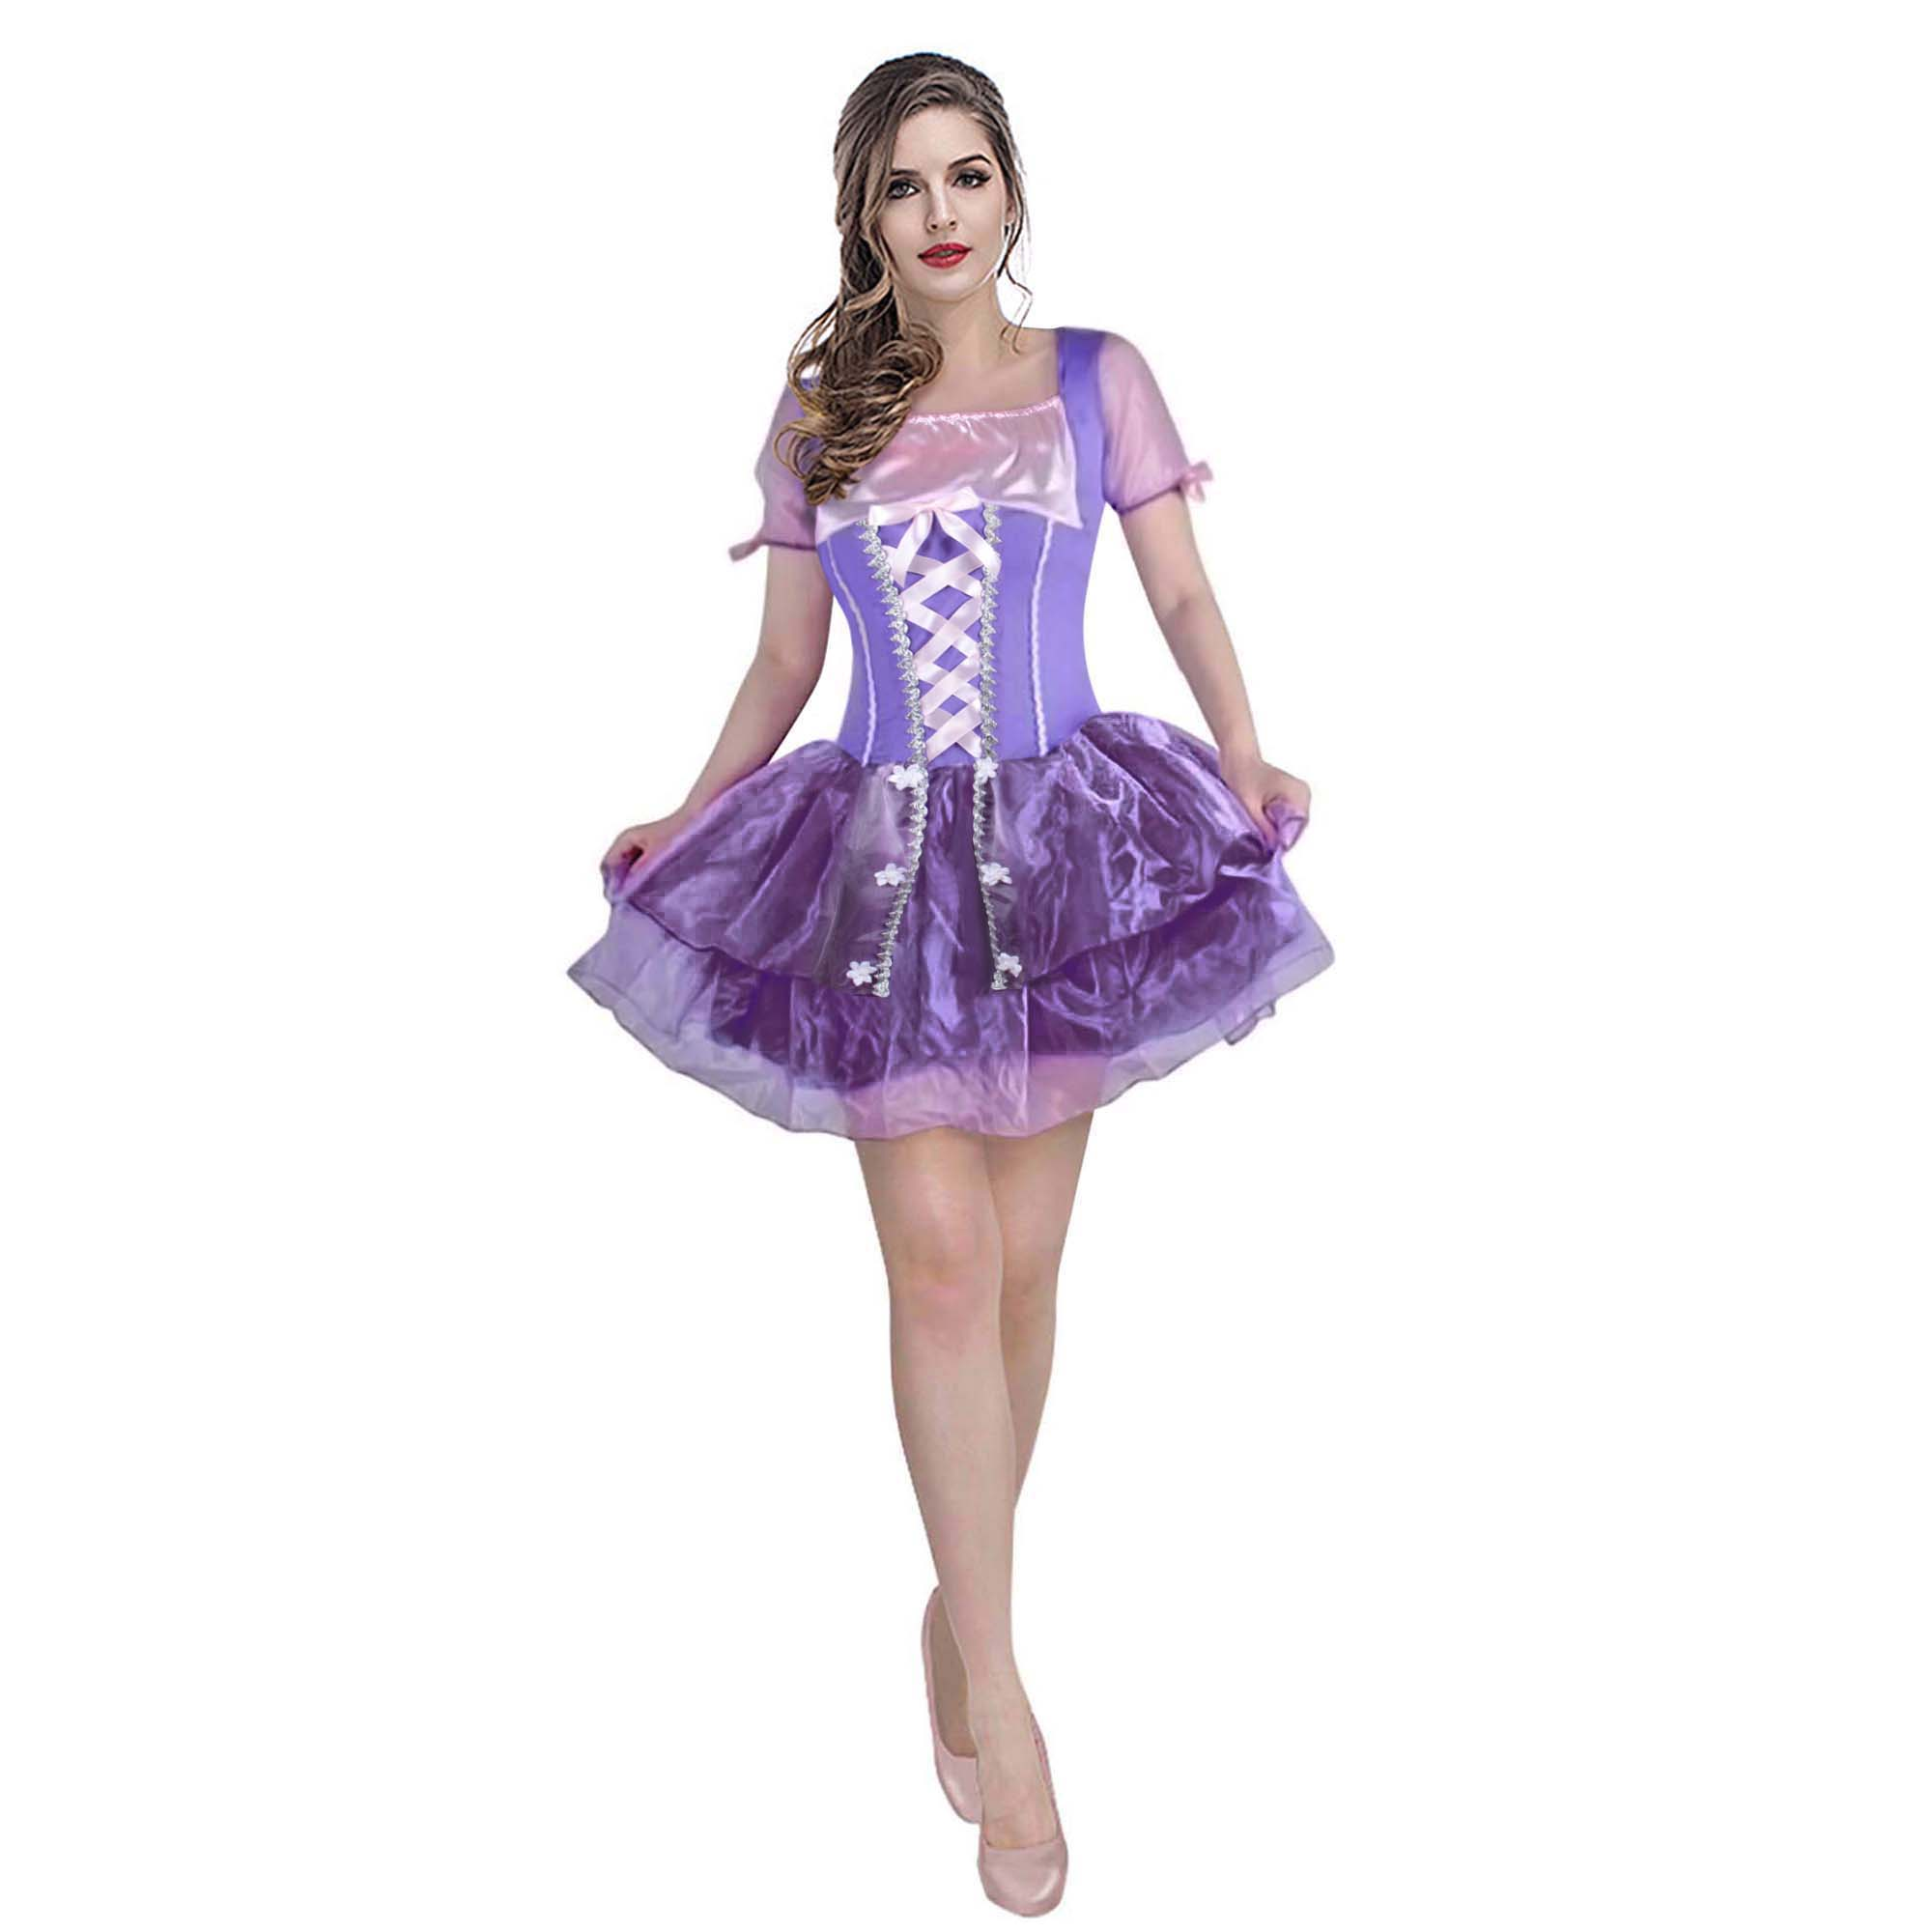 Women's Pricess Rapunzel Costume Tangled Cosplay Purple Tulle Short Tutu Dress Fairytale Costume Carnival Halloween Fancy Dress